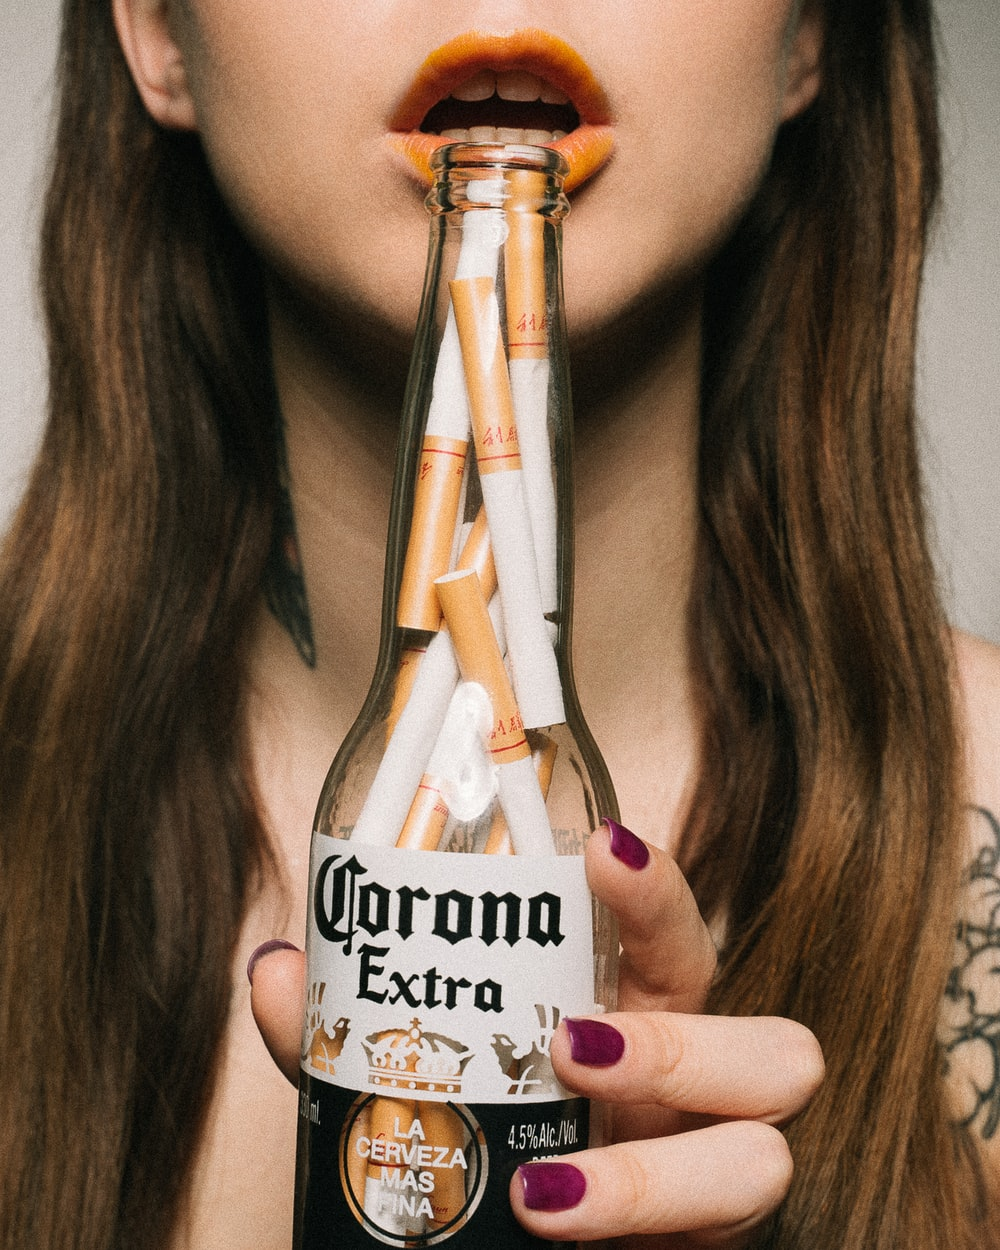 woman holding Corona Extra beer bottle